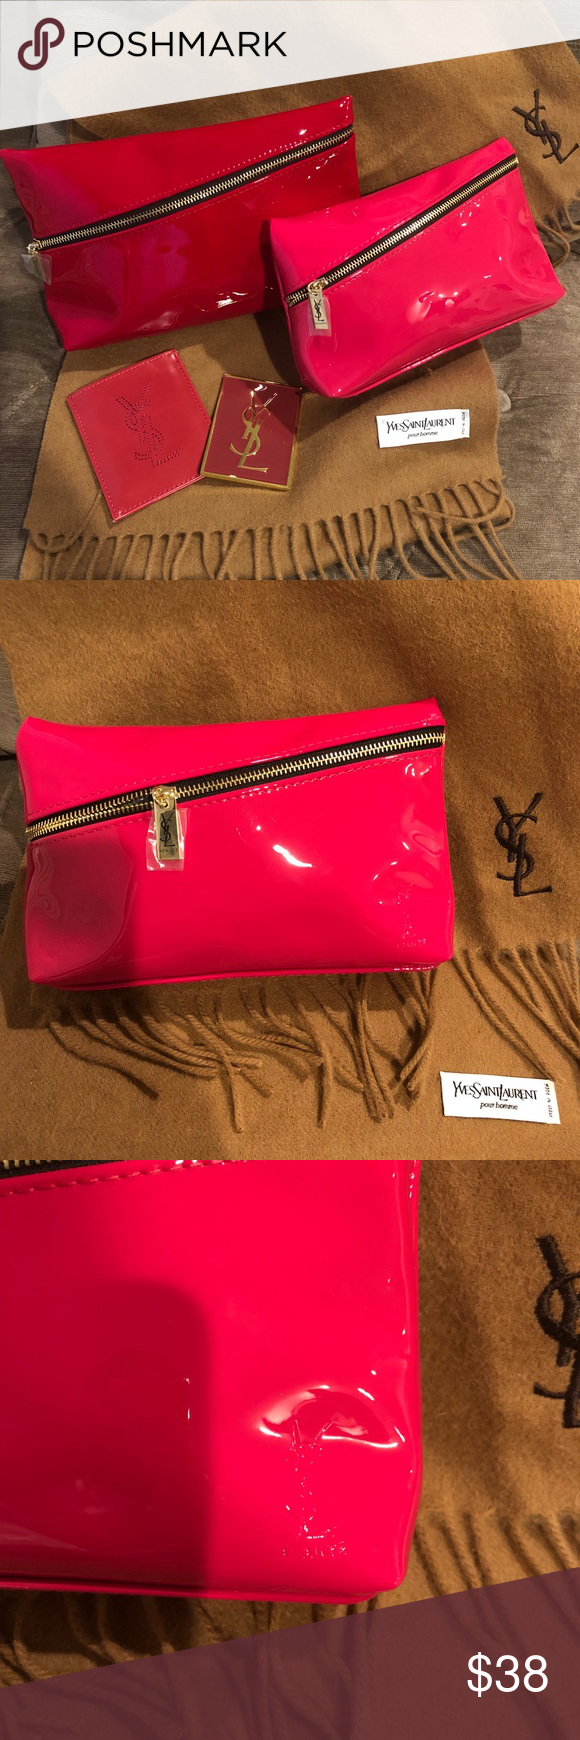 376ea30a840b Authentic NWOT Yves Saint Laurent YSL Makeup Bag Authentic NWOT Yves Saint  Laurent YSL Makeup Bag